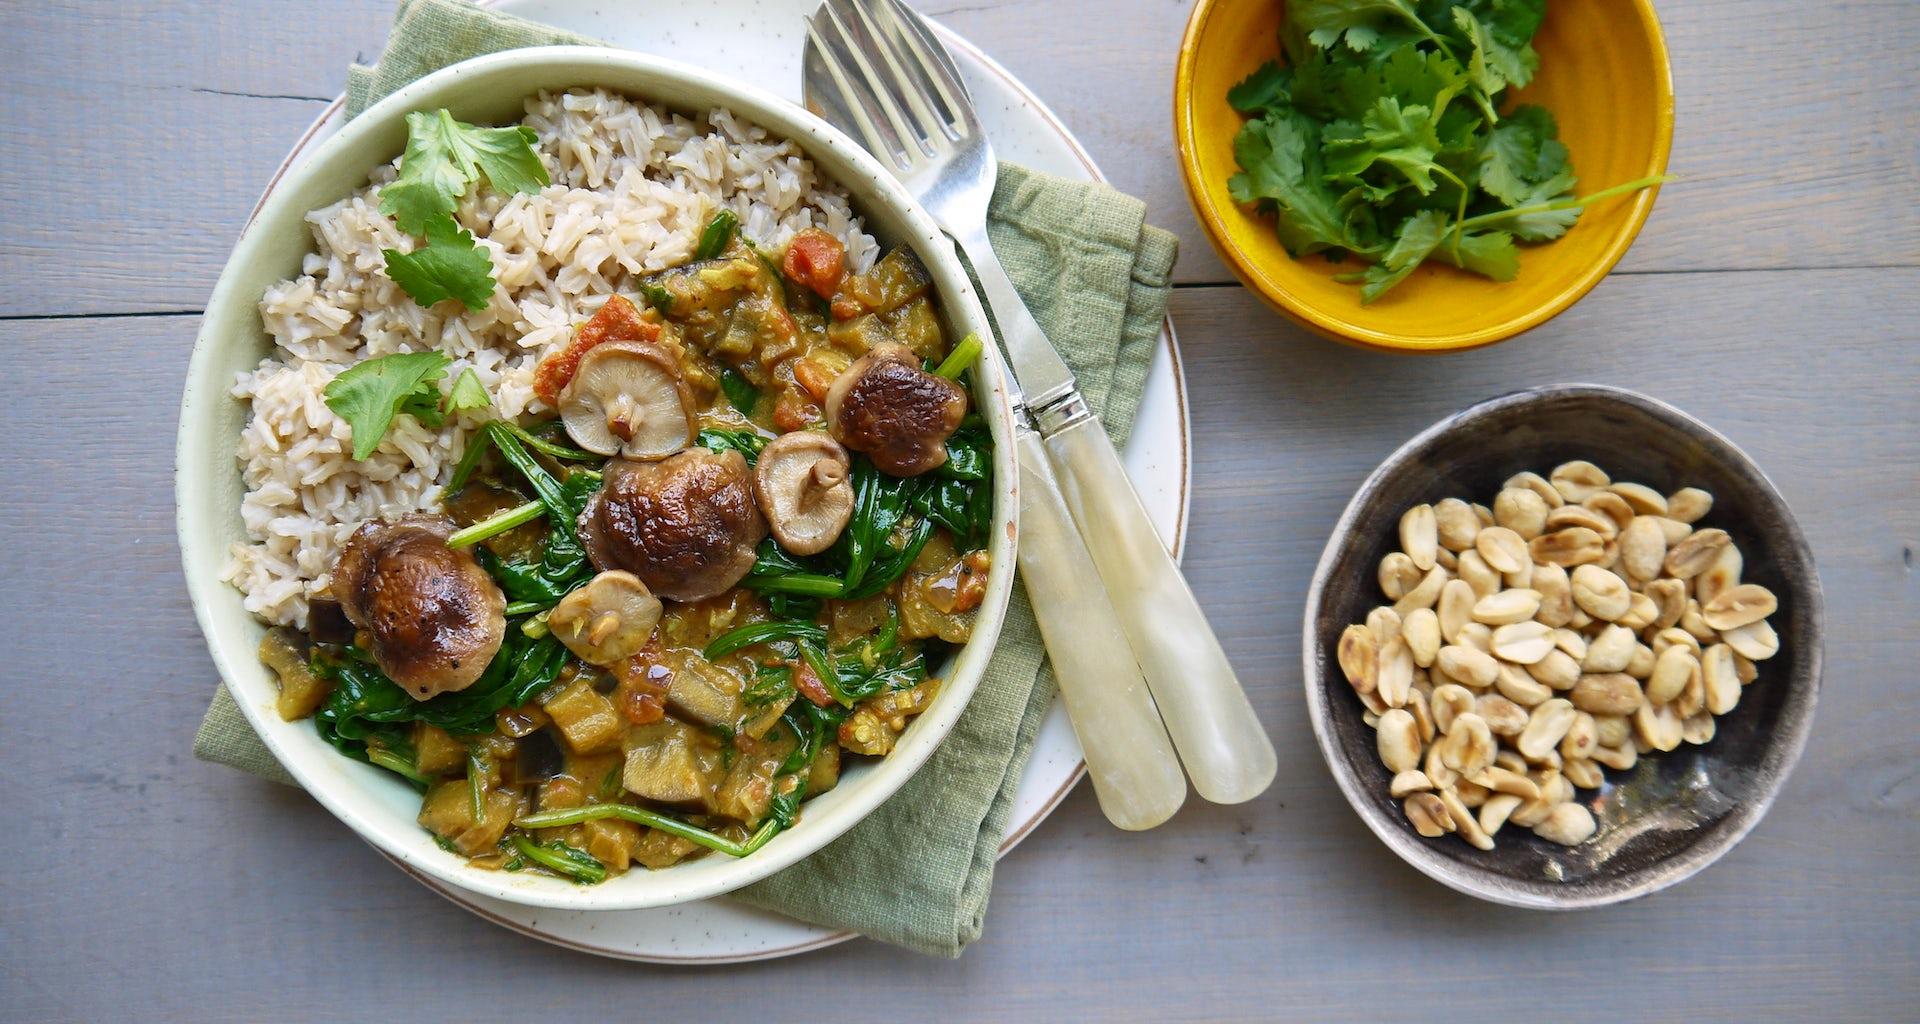 Wk 39 curry spinazie shiitake pinda koriander